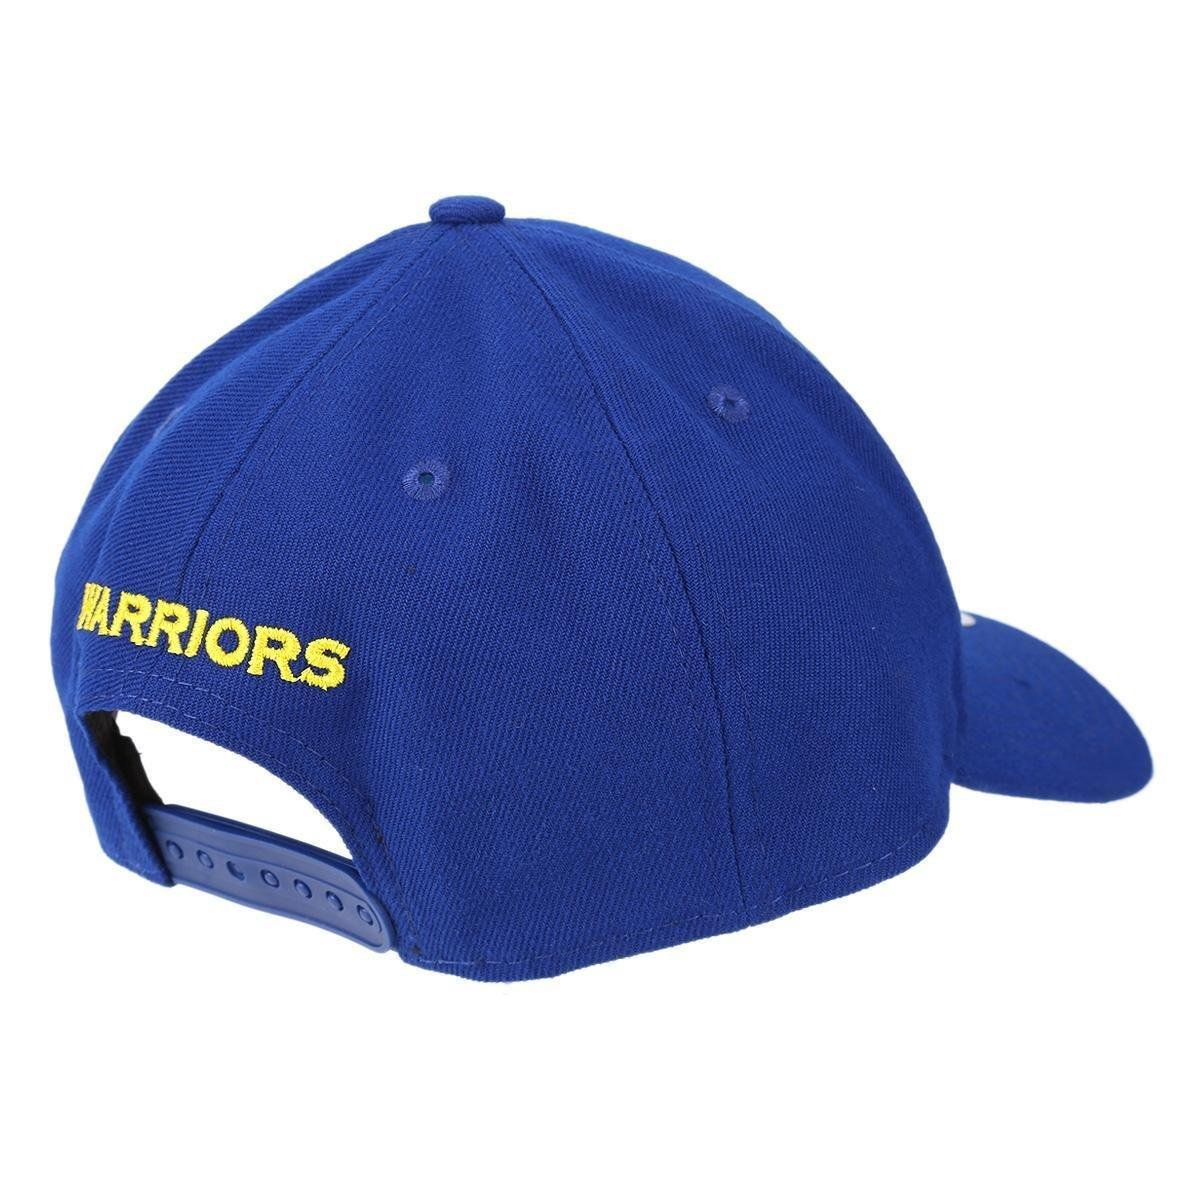 Boné New Era NBA Golden State Warriors Aba Curva Primary - Azul ... f6e01c7b4d9